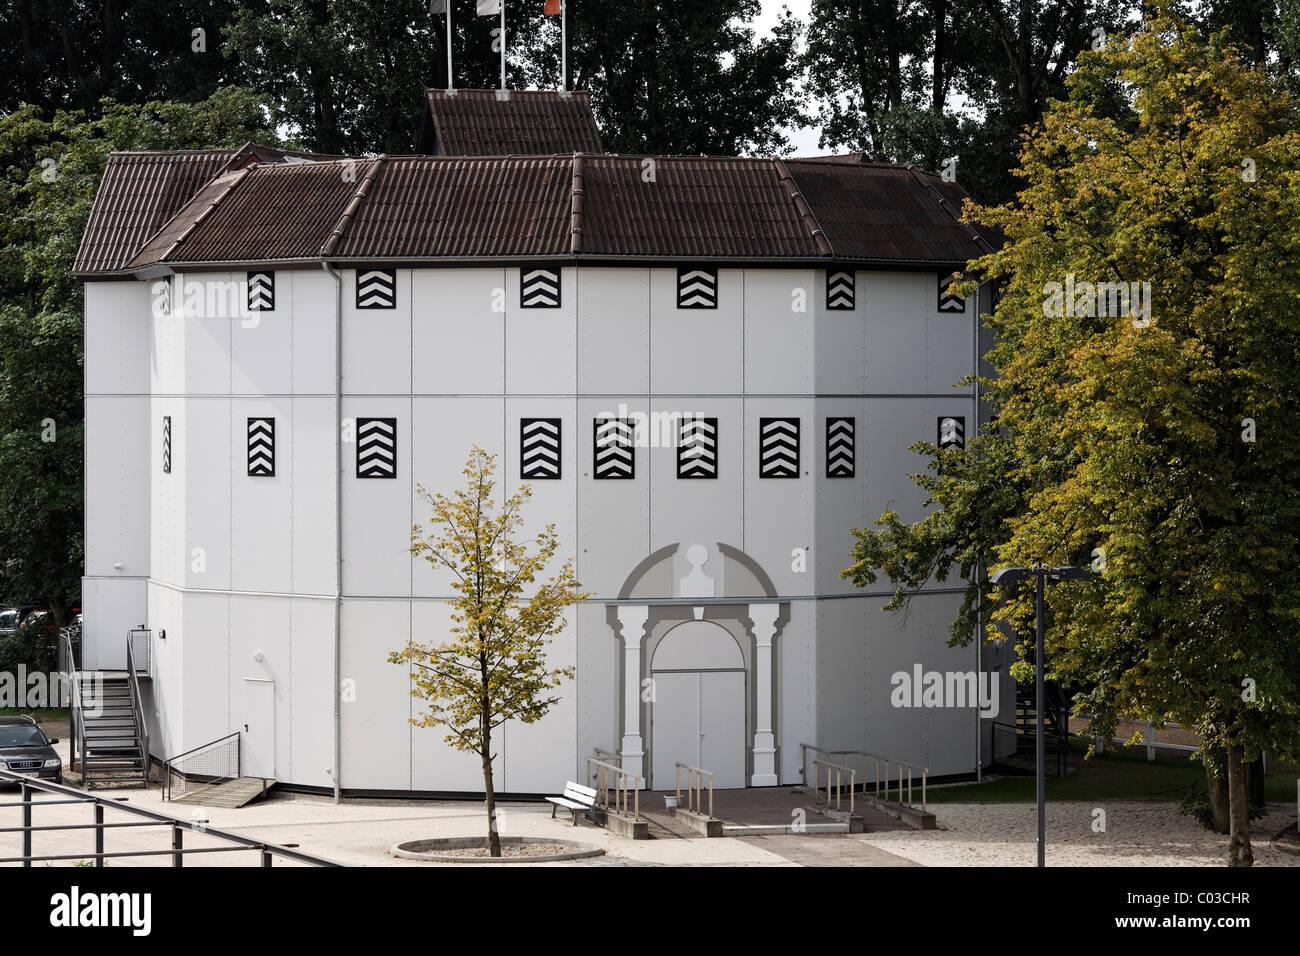 Globe Theatre, replica of the original in London, Shakespeare Festival, Neuss, Niederrhein, North Rhine-Westphalia - Stock Image